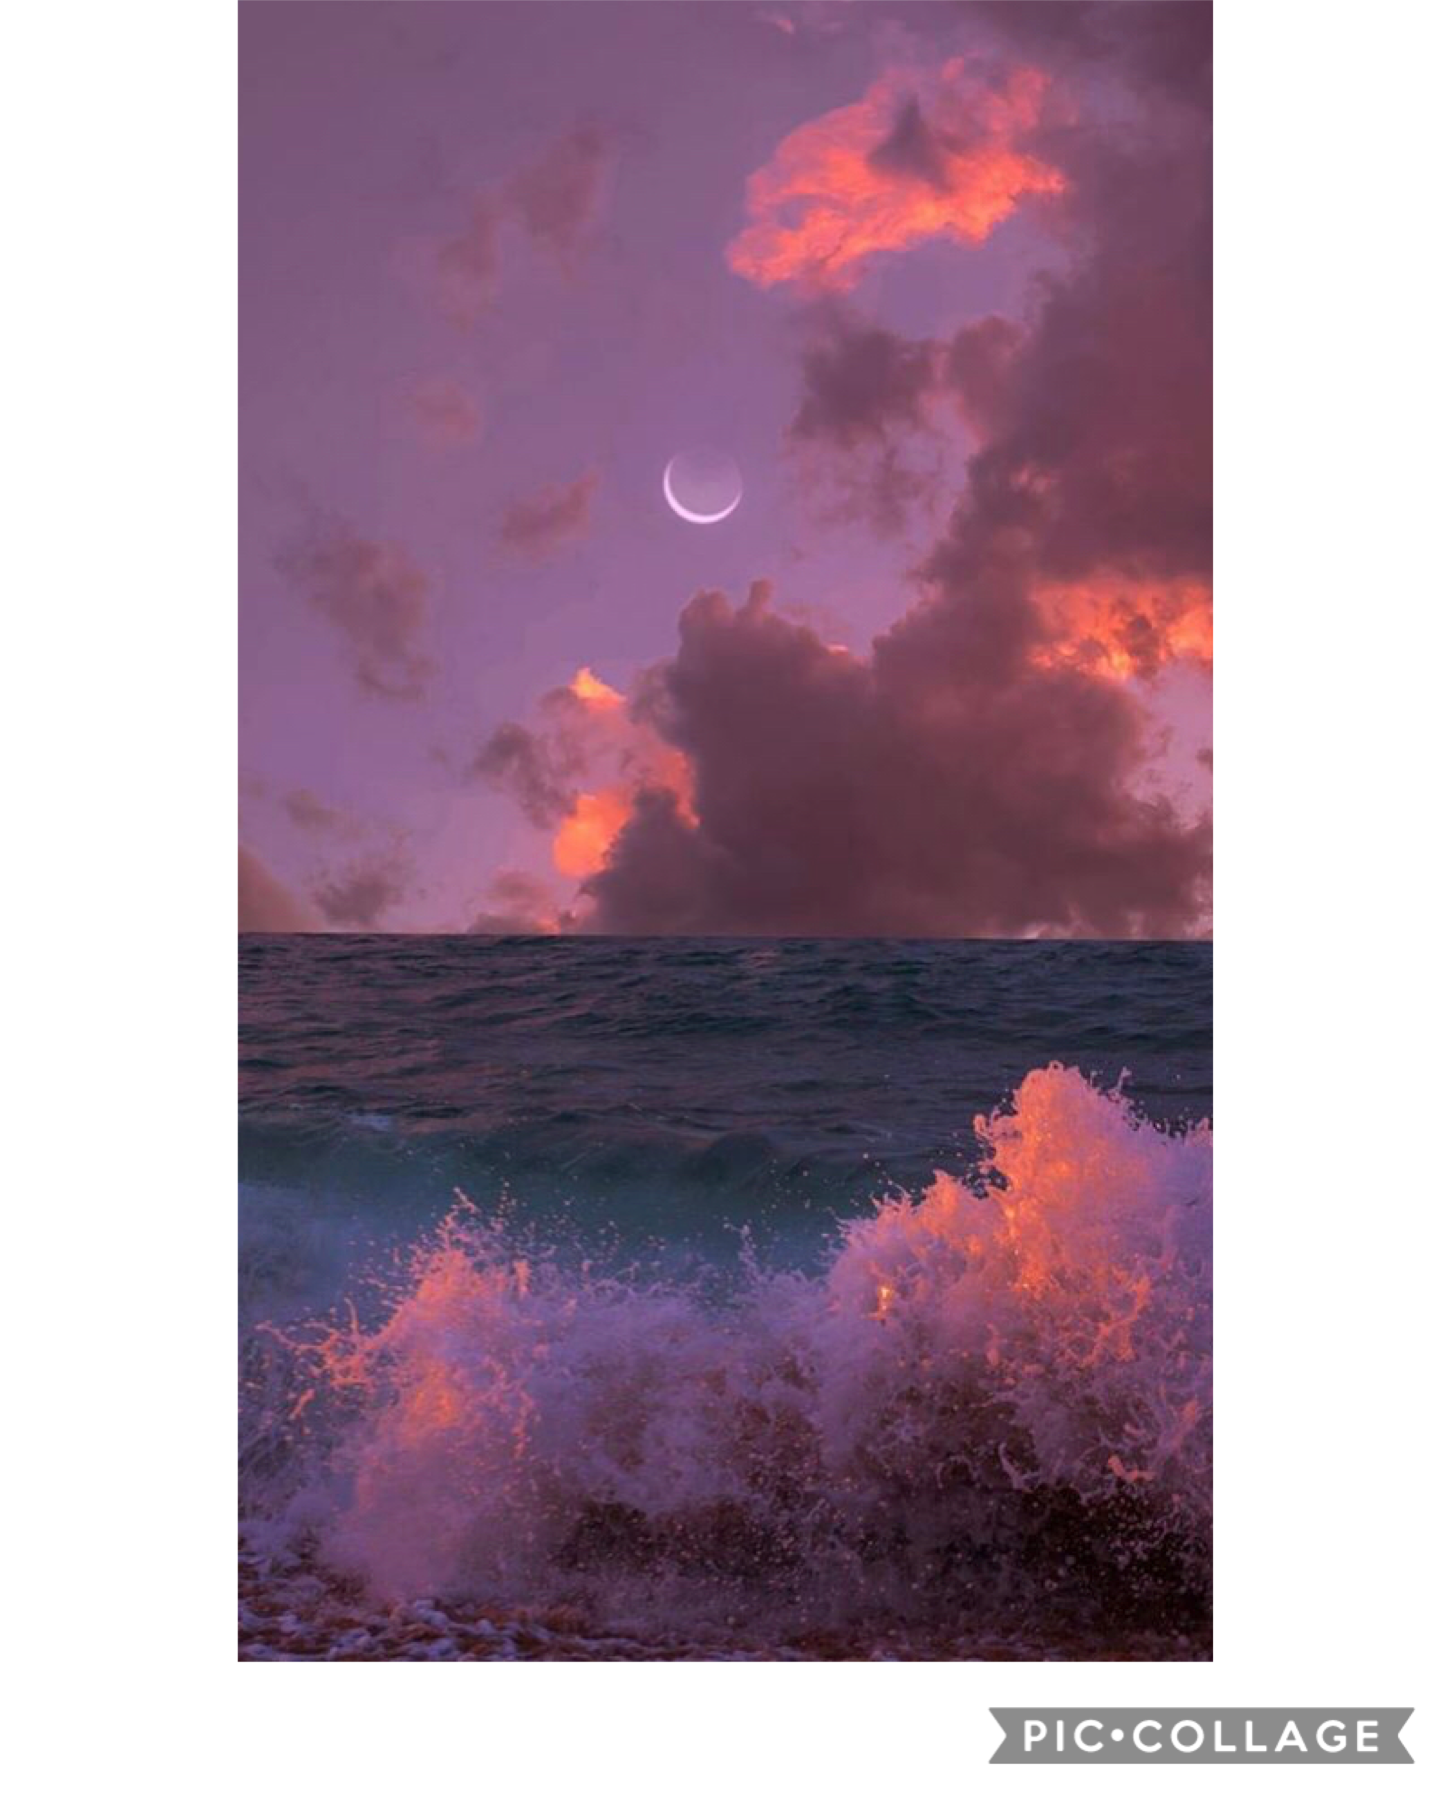 Collage by kiwiberri